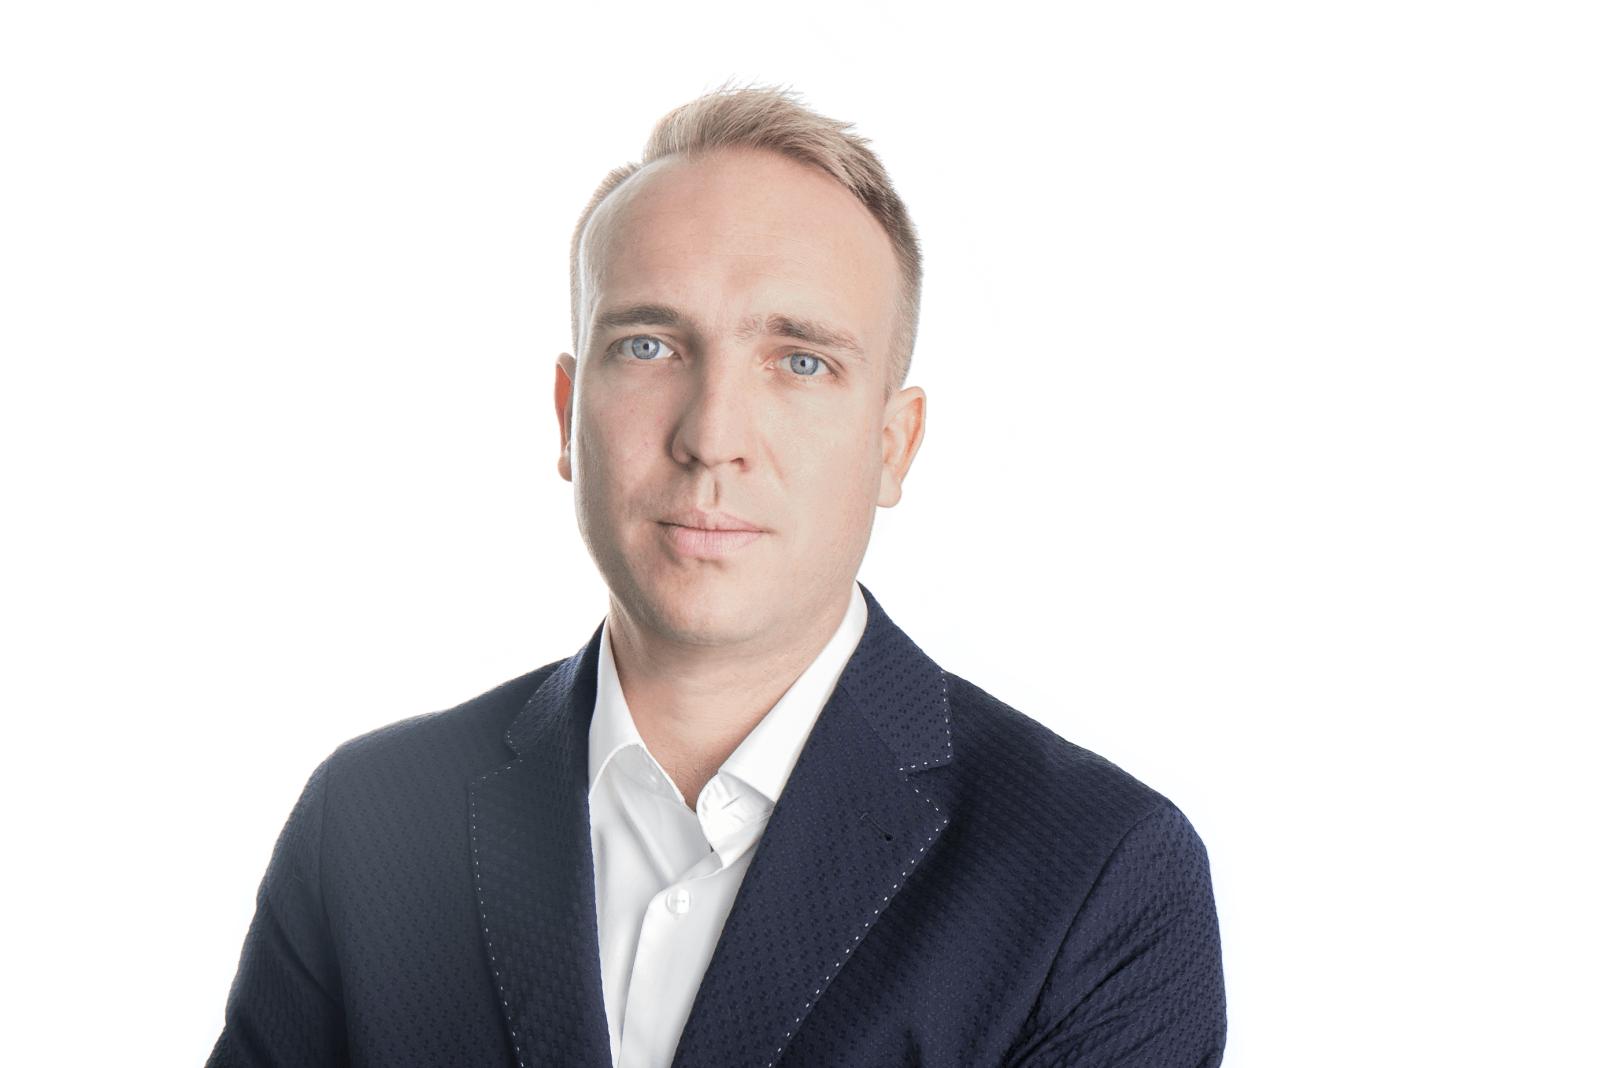 Grzegorz Morawski, franšizni menadžer škole programiranja Coders Lab